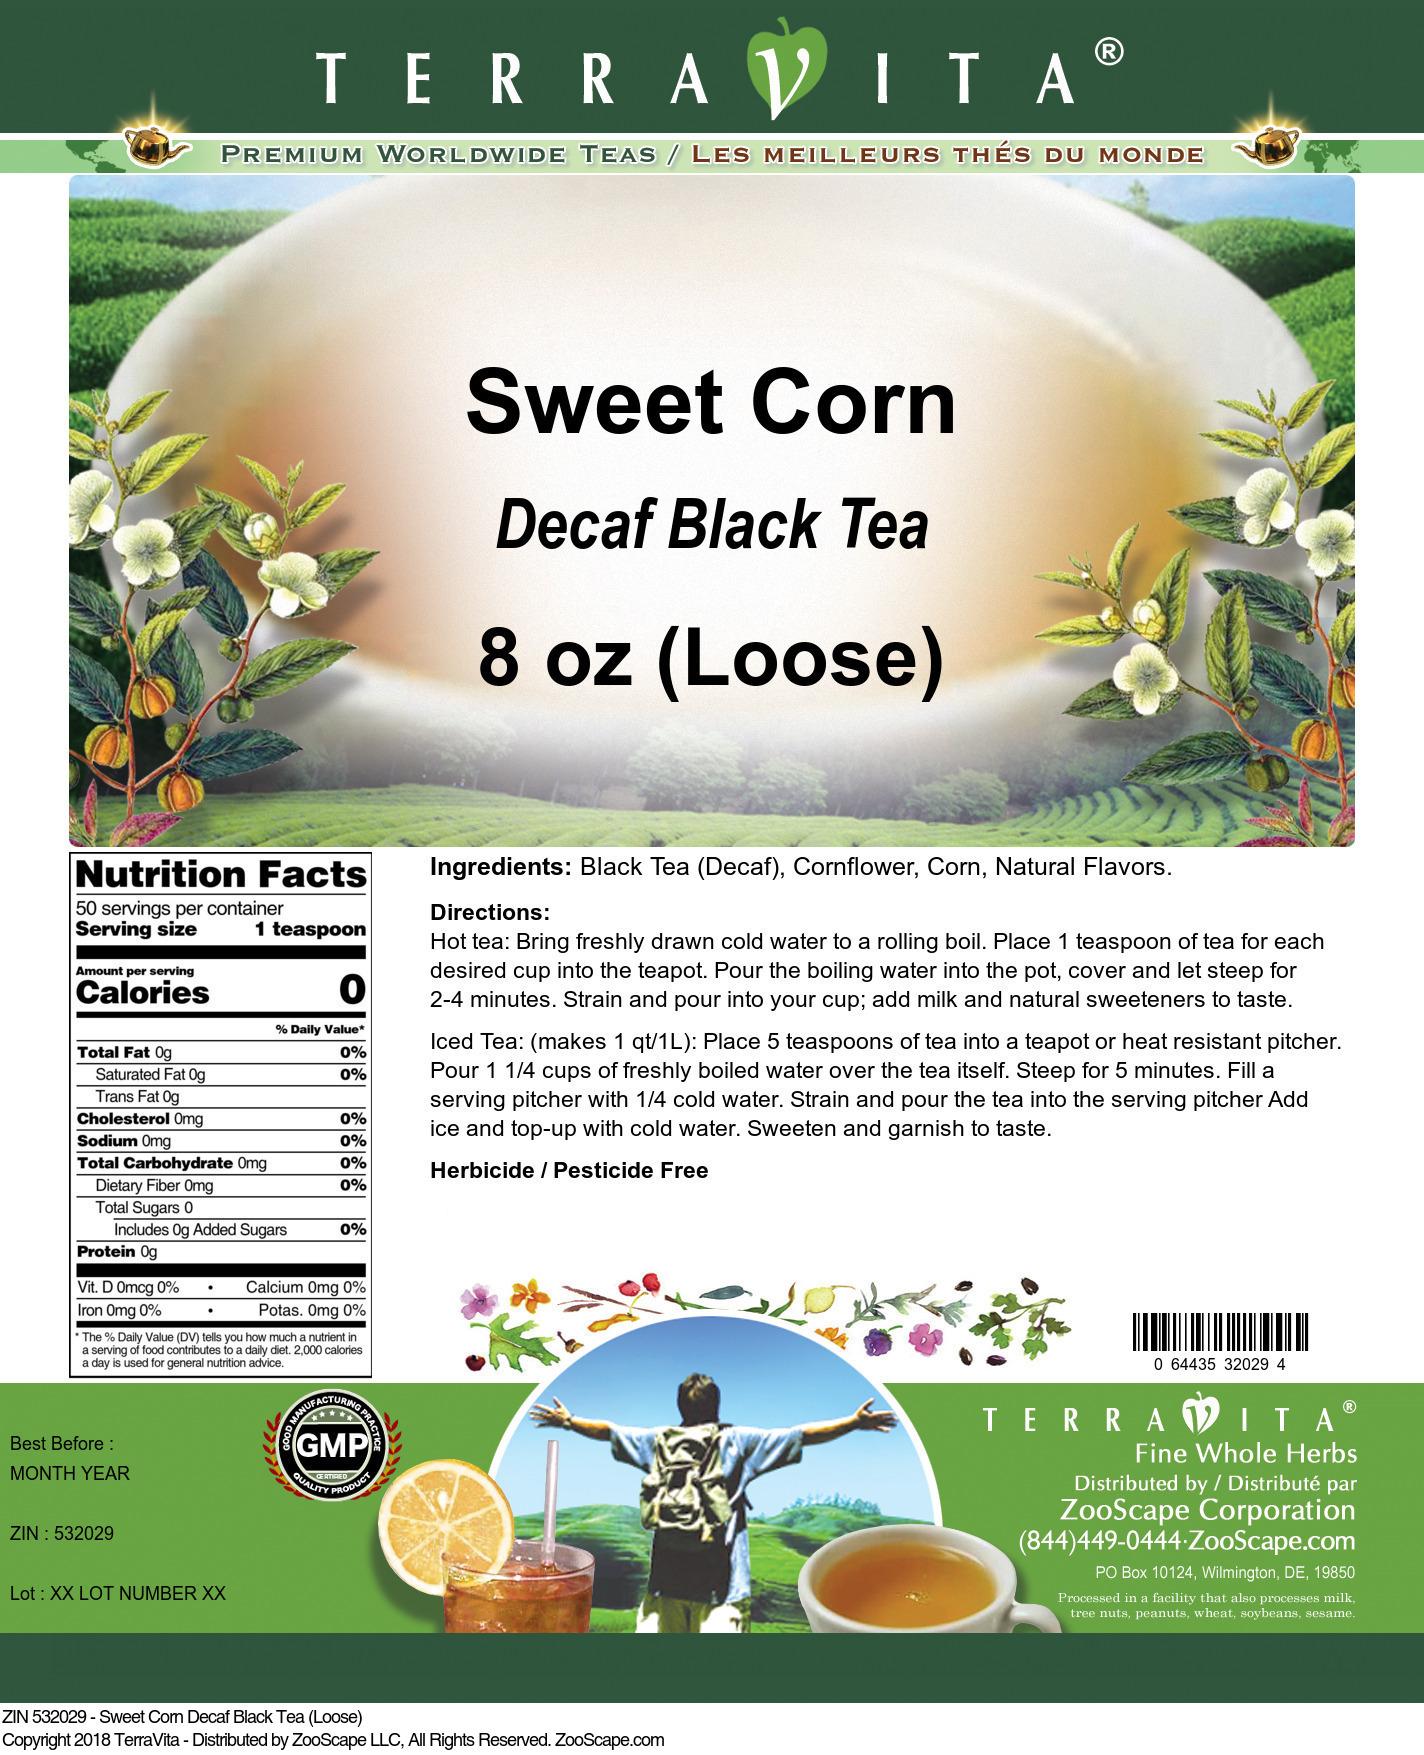 Sweet Corn Decaf Black Tea